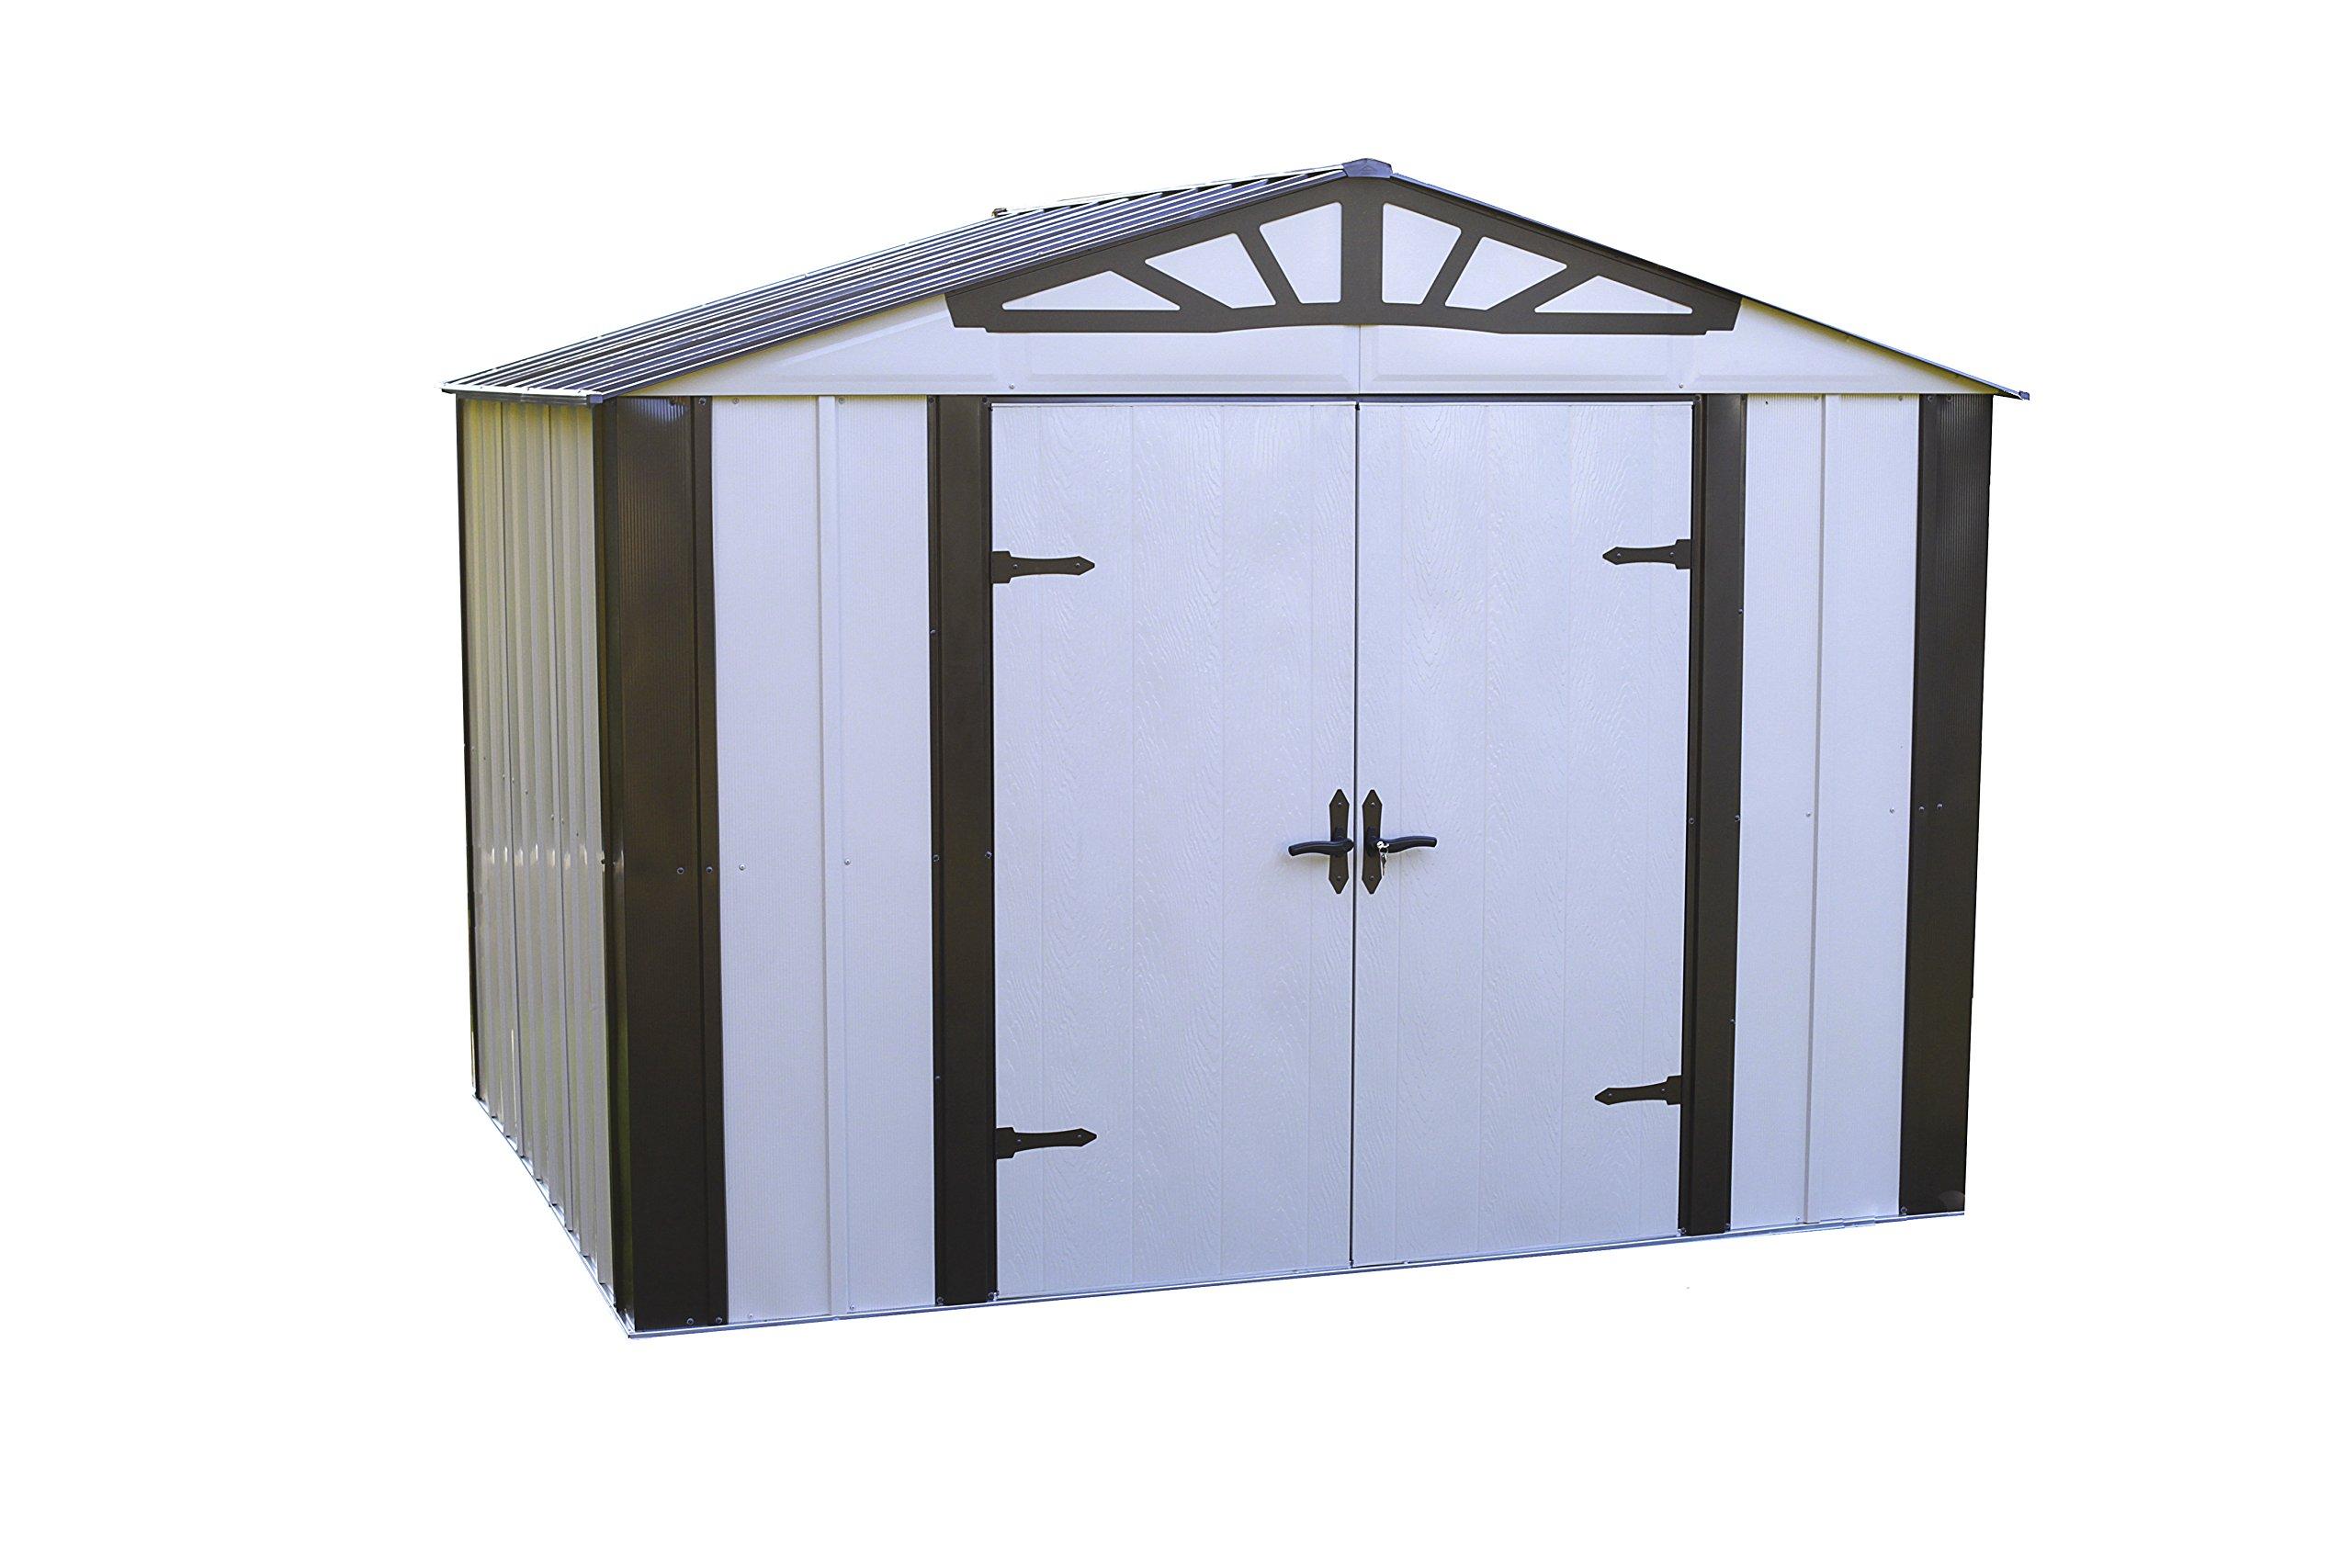 Arrow Designer Metro Shed Hot Dipped Galvanized Steel High Gable Swing Doors, 10'' x 8'', Java/Sand